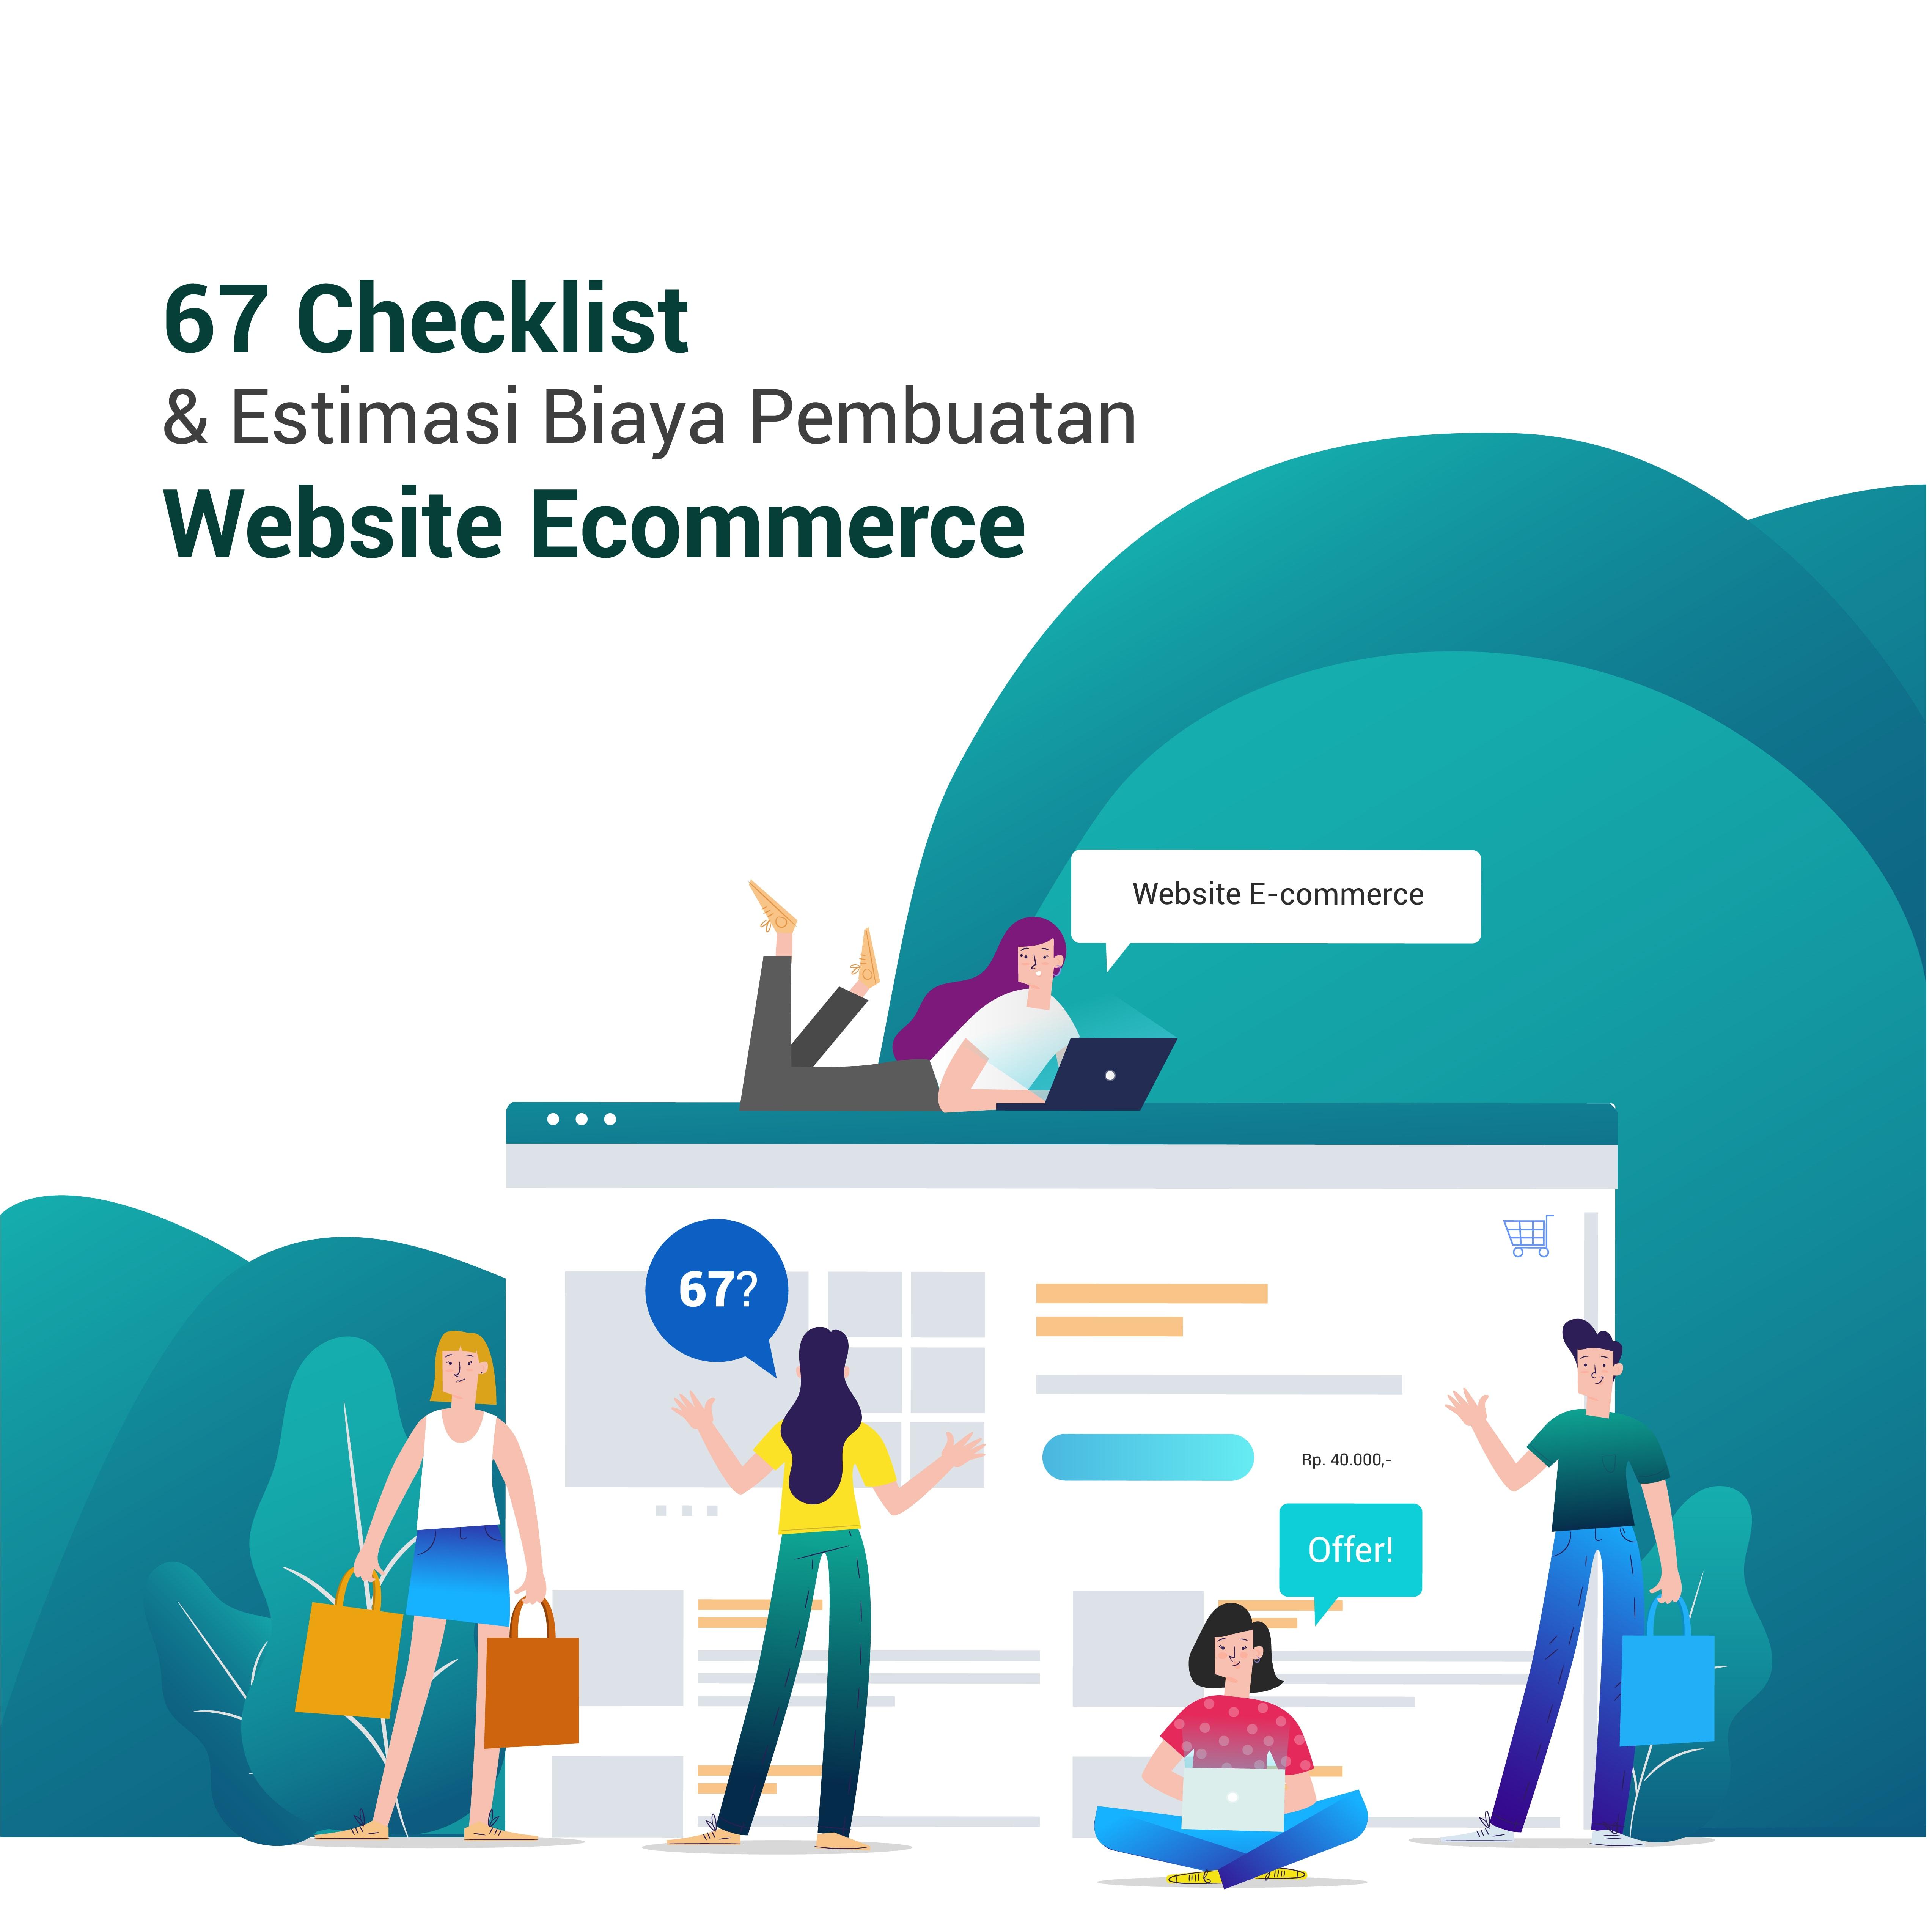 67 Checklist & Estimasi Biaya Jasa Pembuatan Website Ecommerce